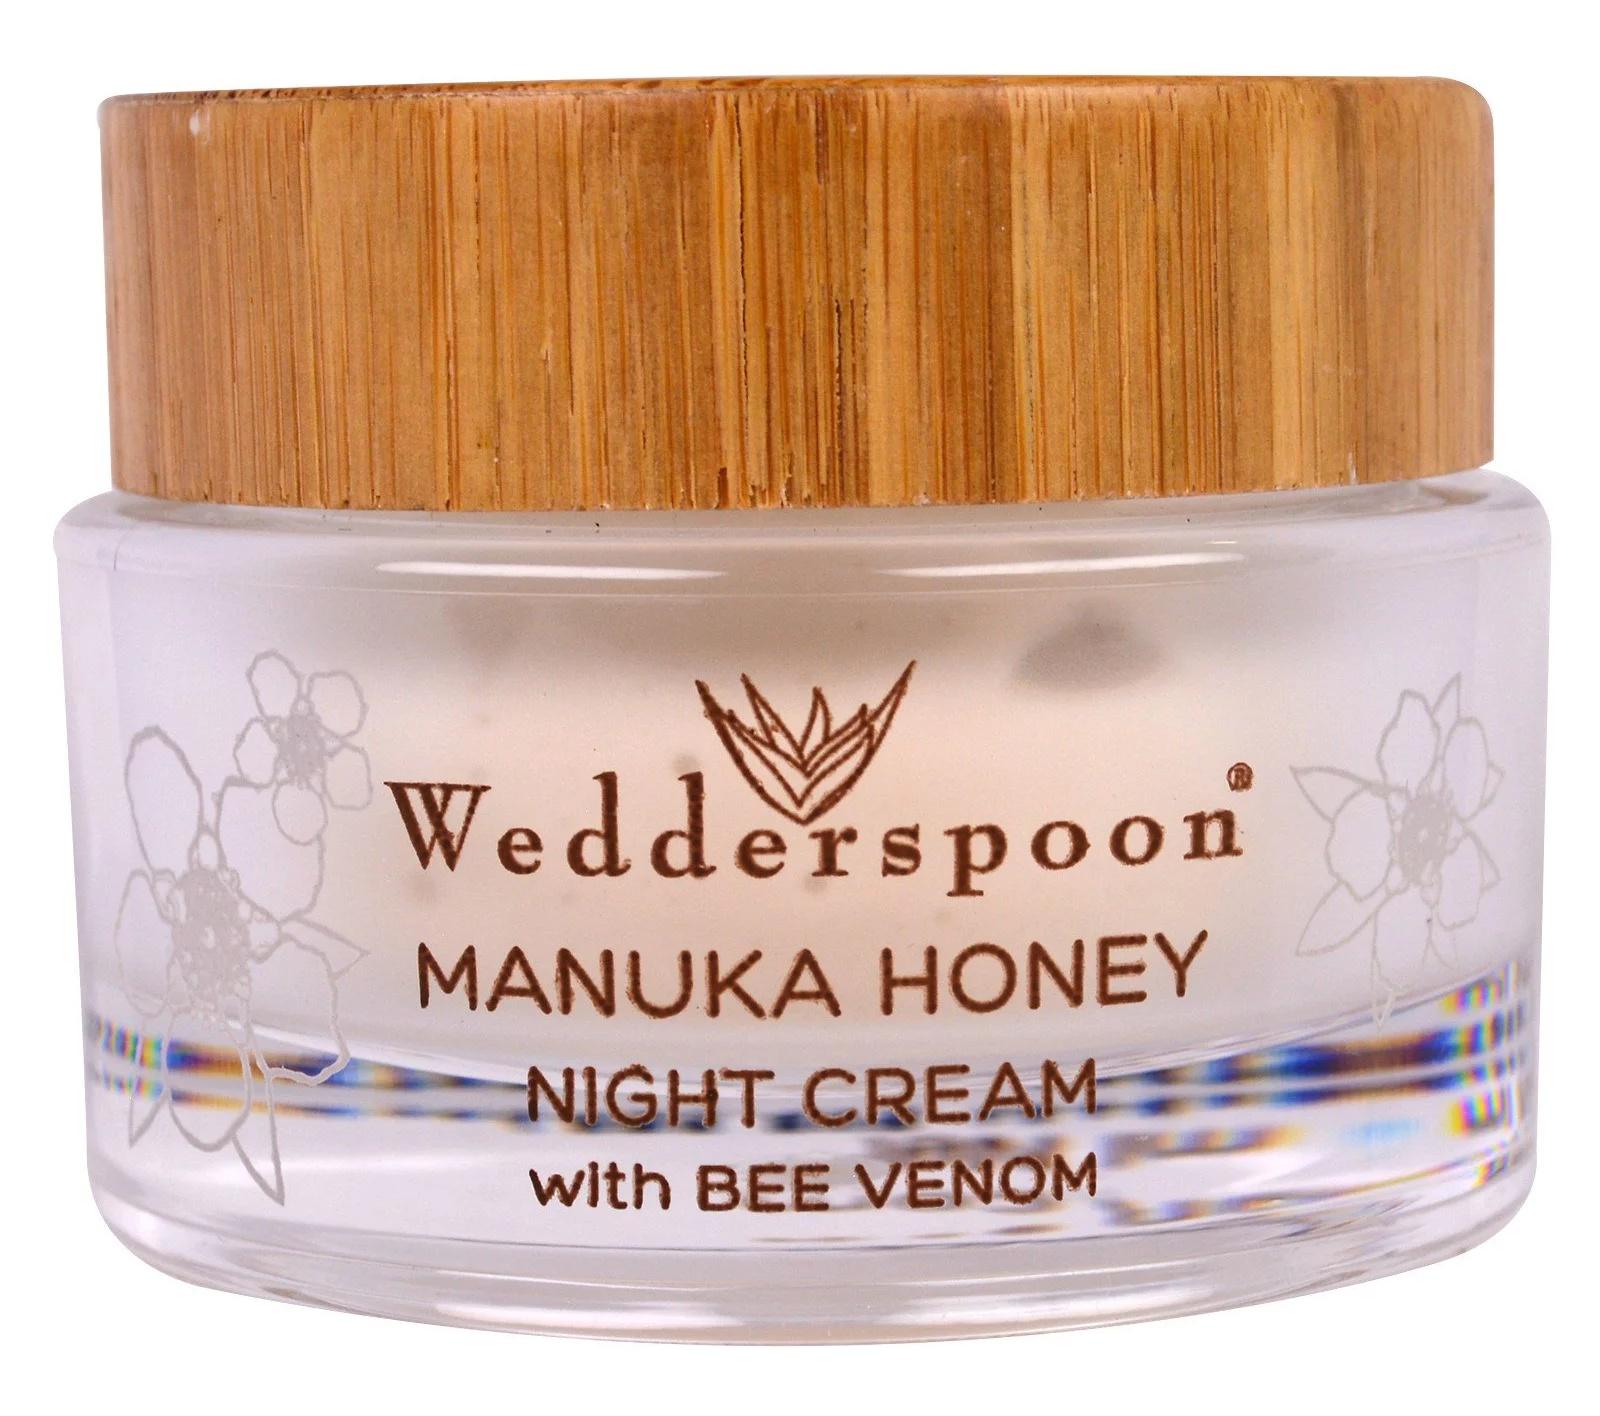 Wedderspoon Manuka Honey Night Cream With Bee Venom